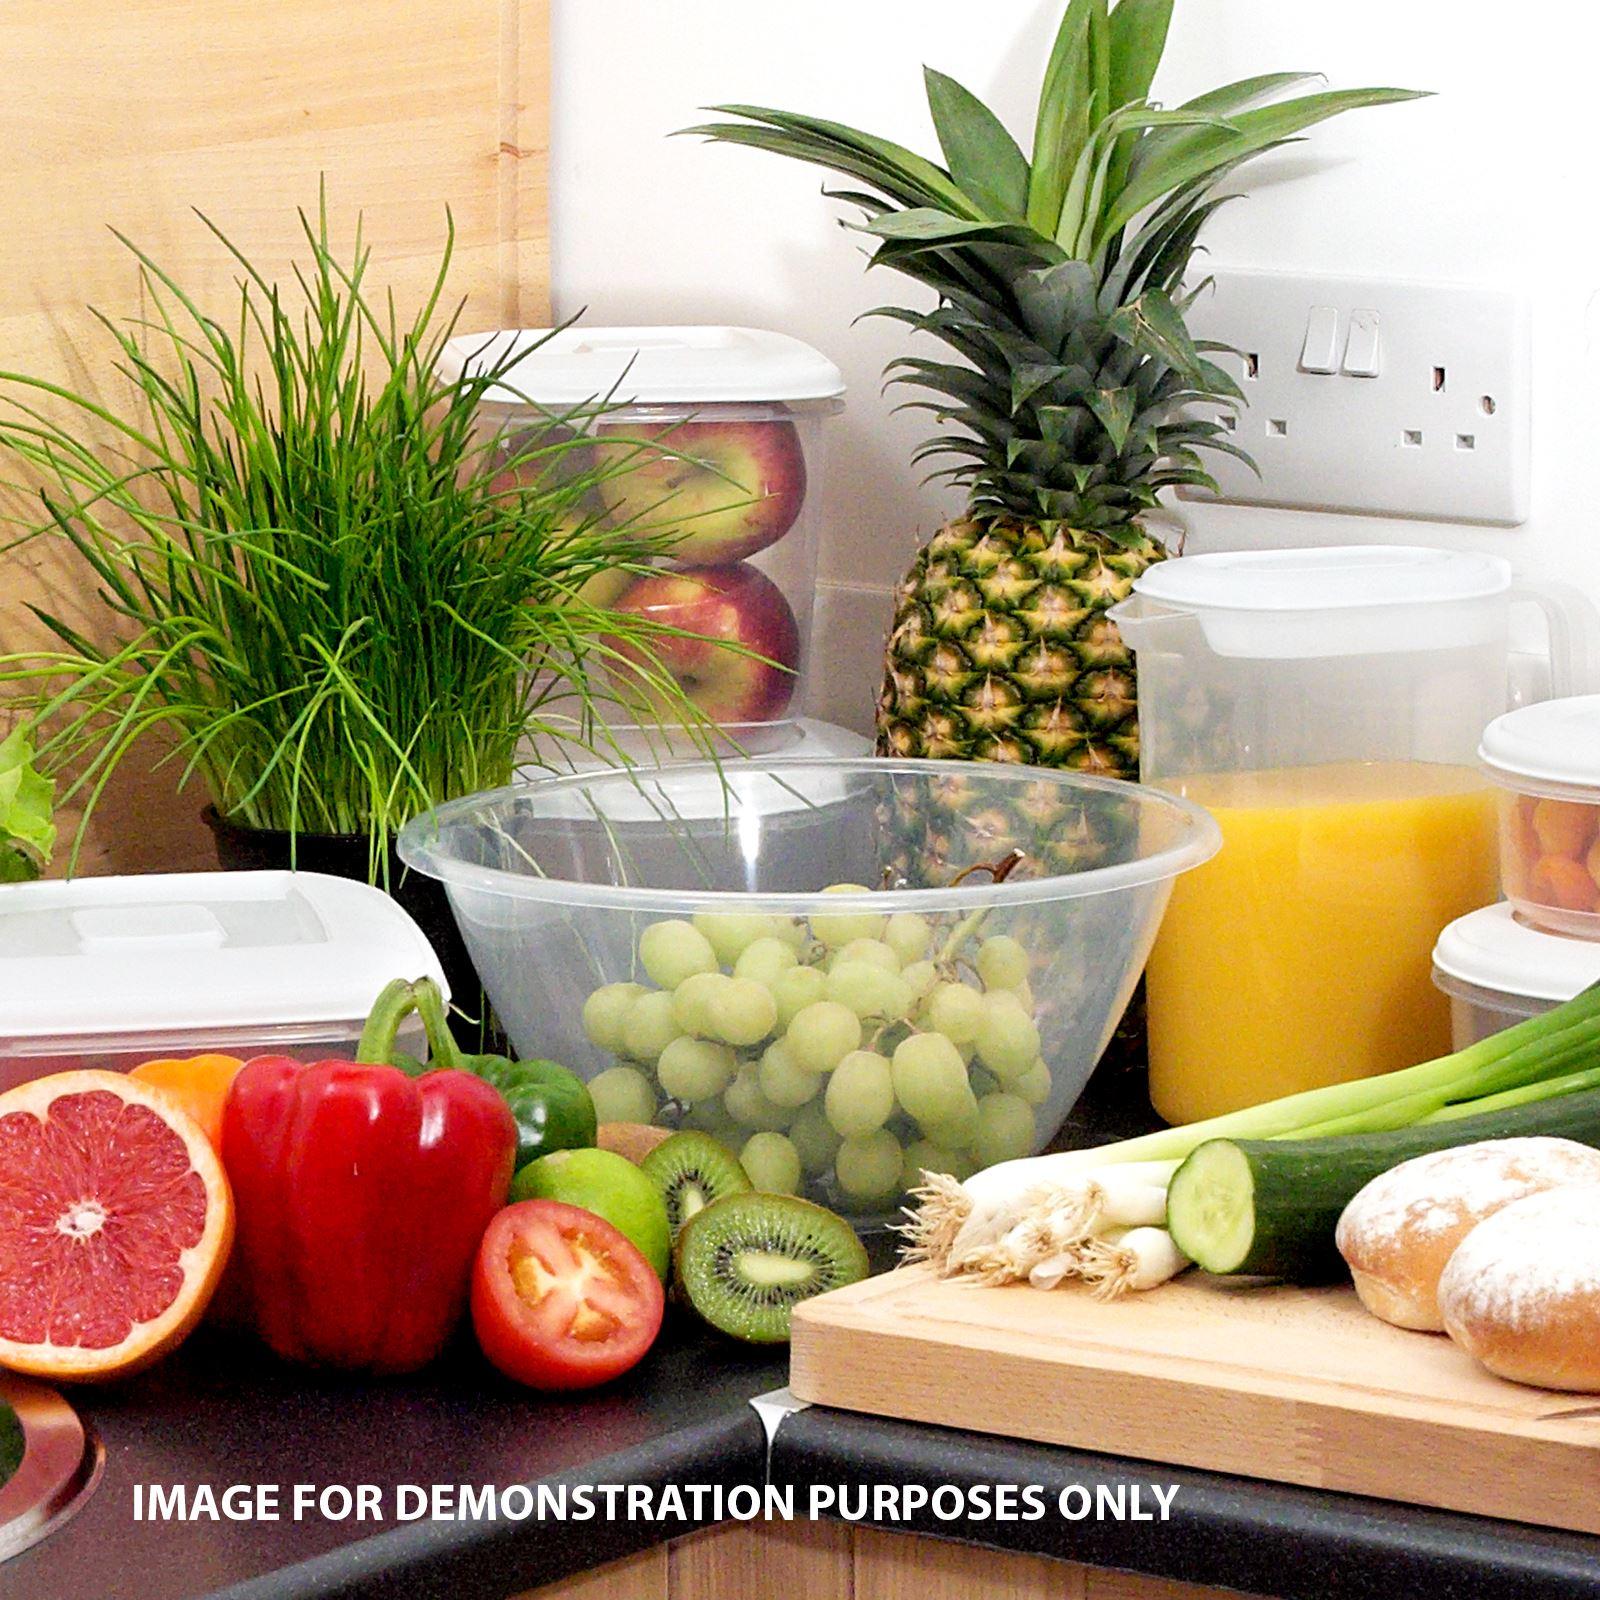 Clear-Plastic-Mixing-Bowl-Measuring-Baking-Salad-Serving-Cooking-Kitchen-Bowls thumbnail 3